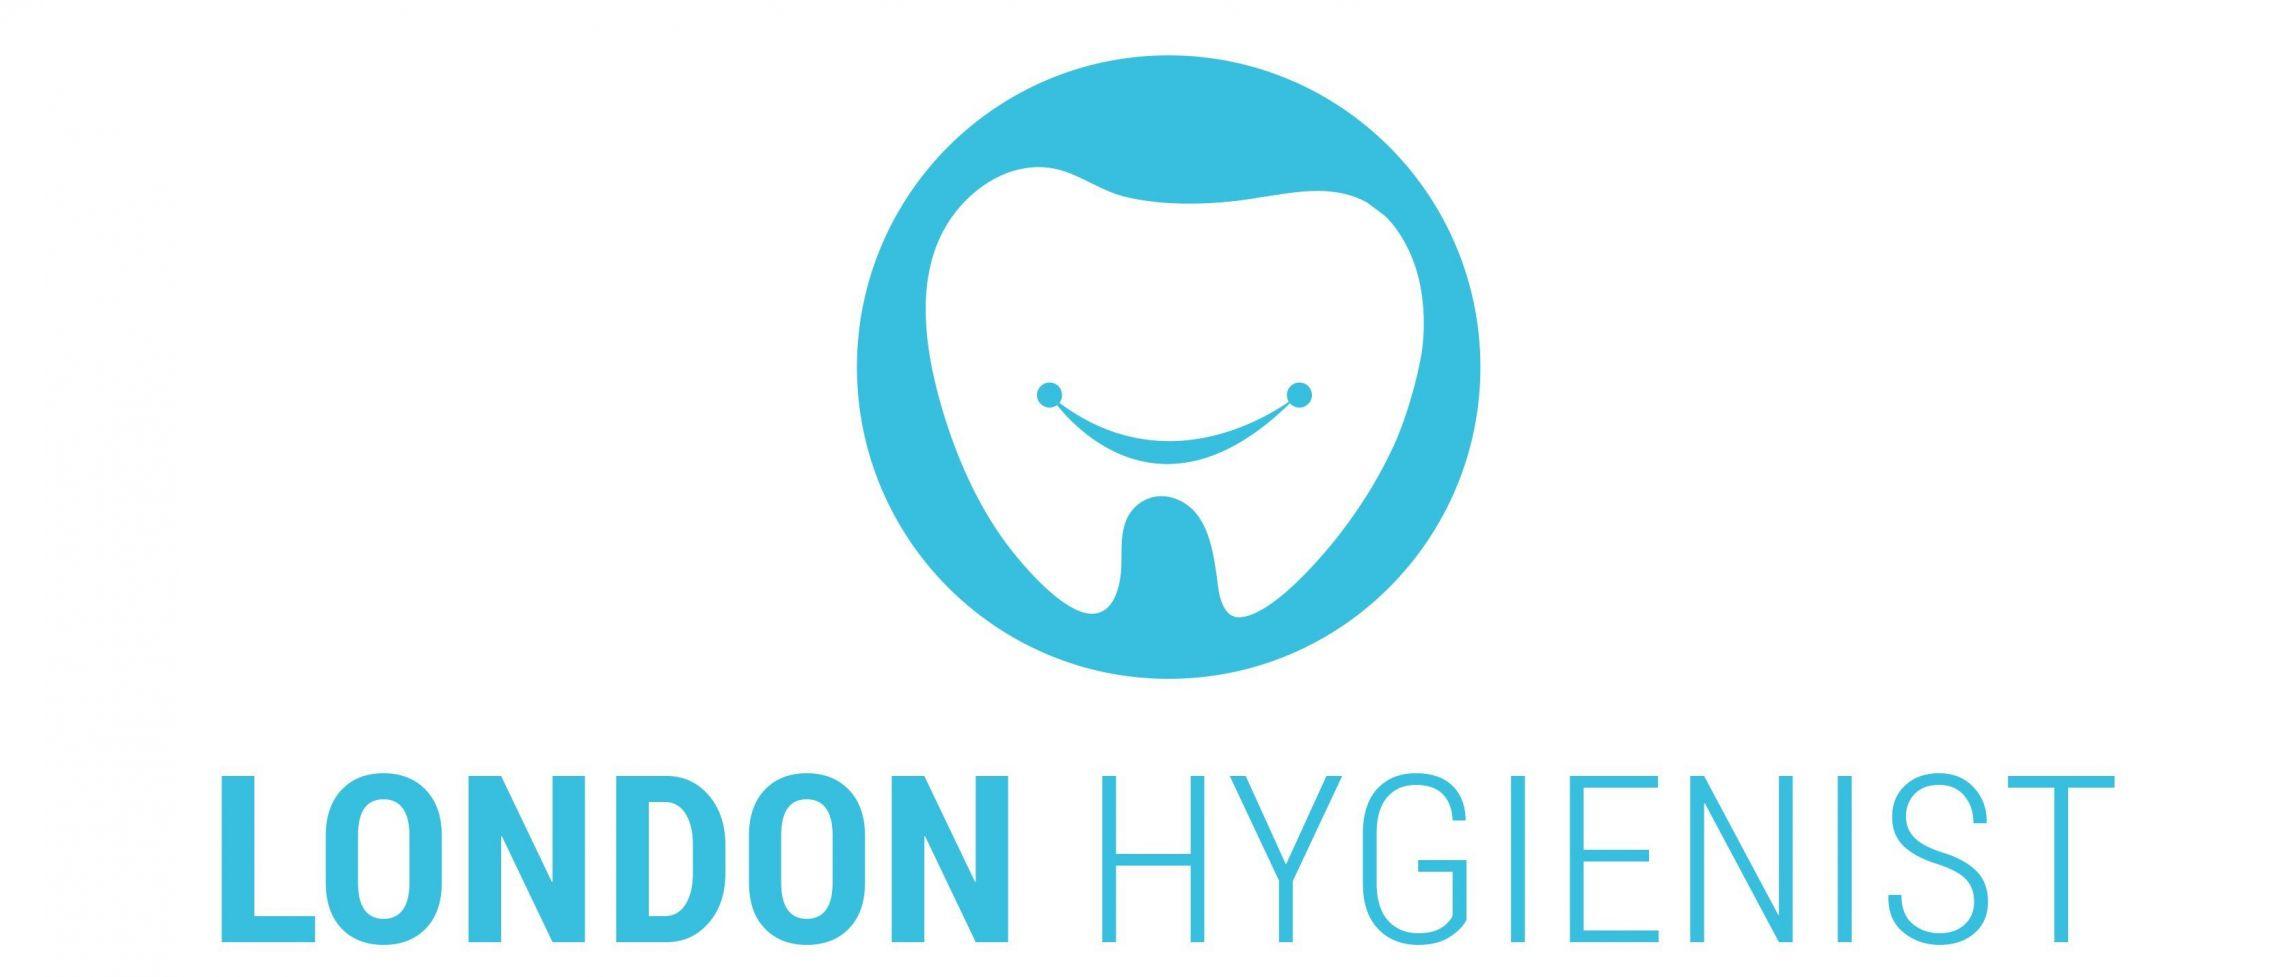 London Hygienist